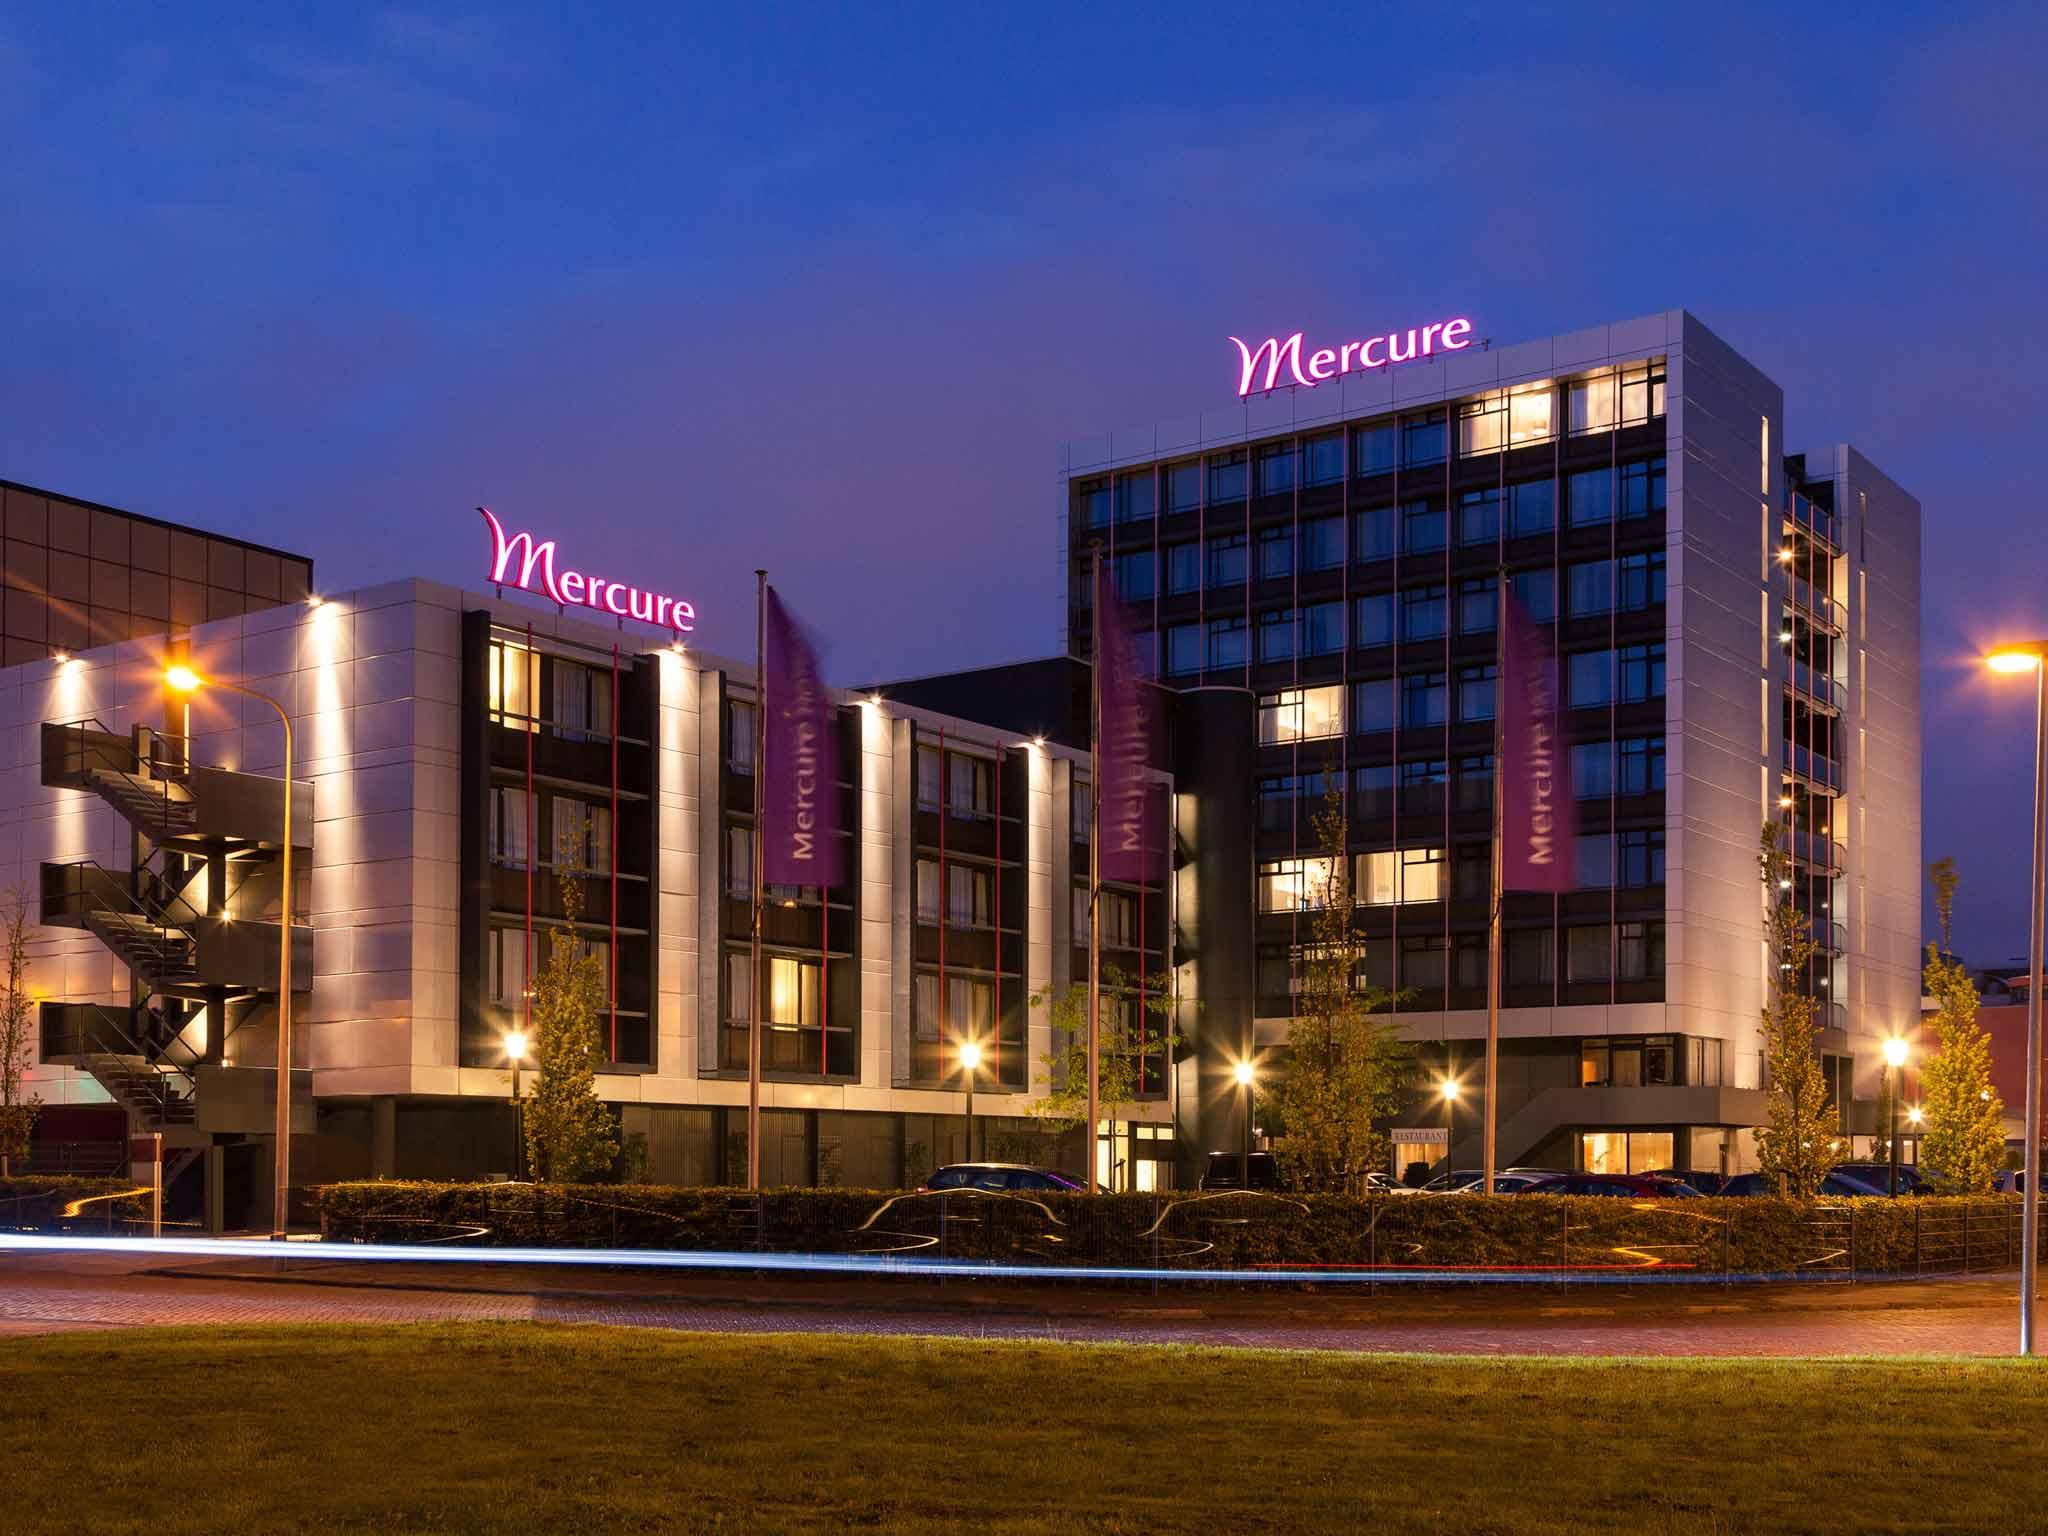 zakelijk hotel groningen mercure hotels naast snelweg. Black Bedroom Furniture Sets. Home Design Ideas